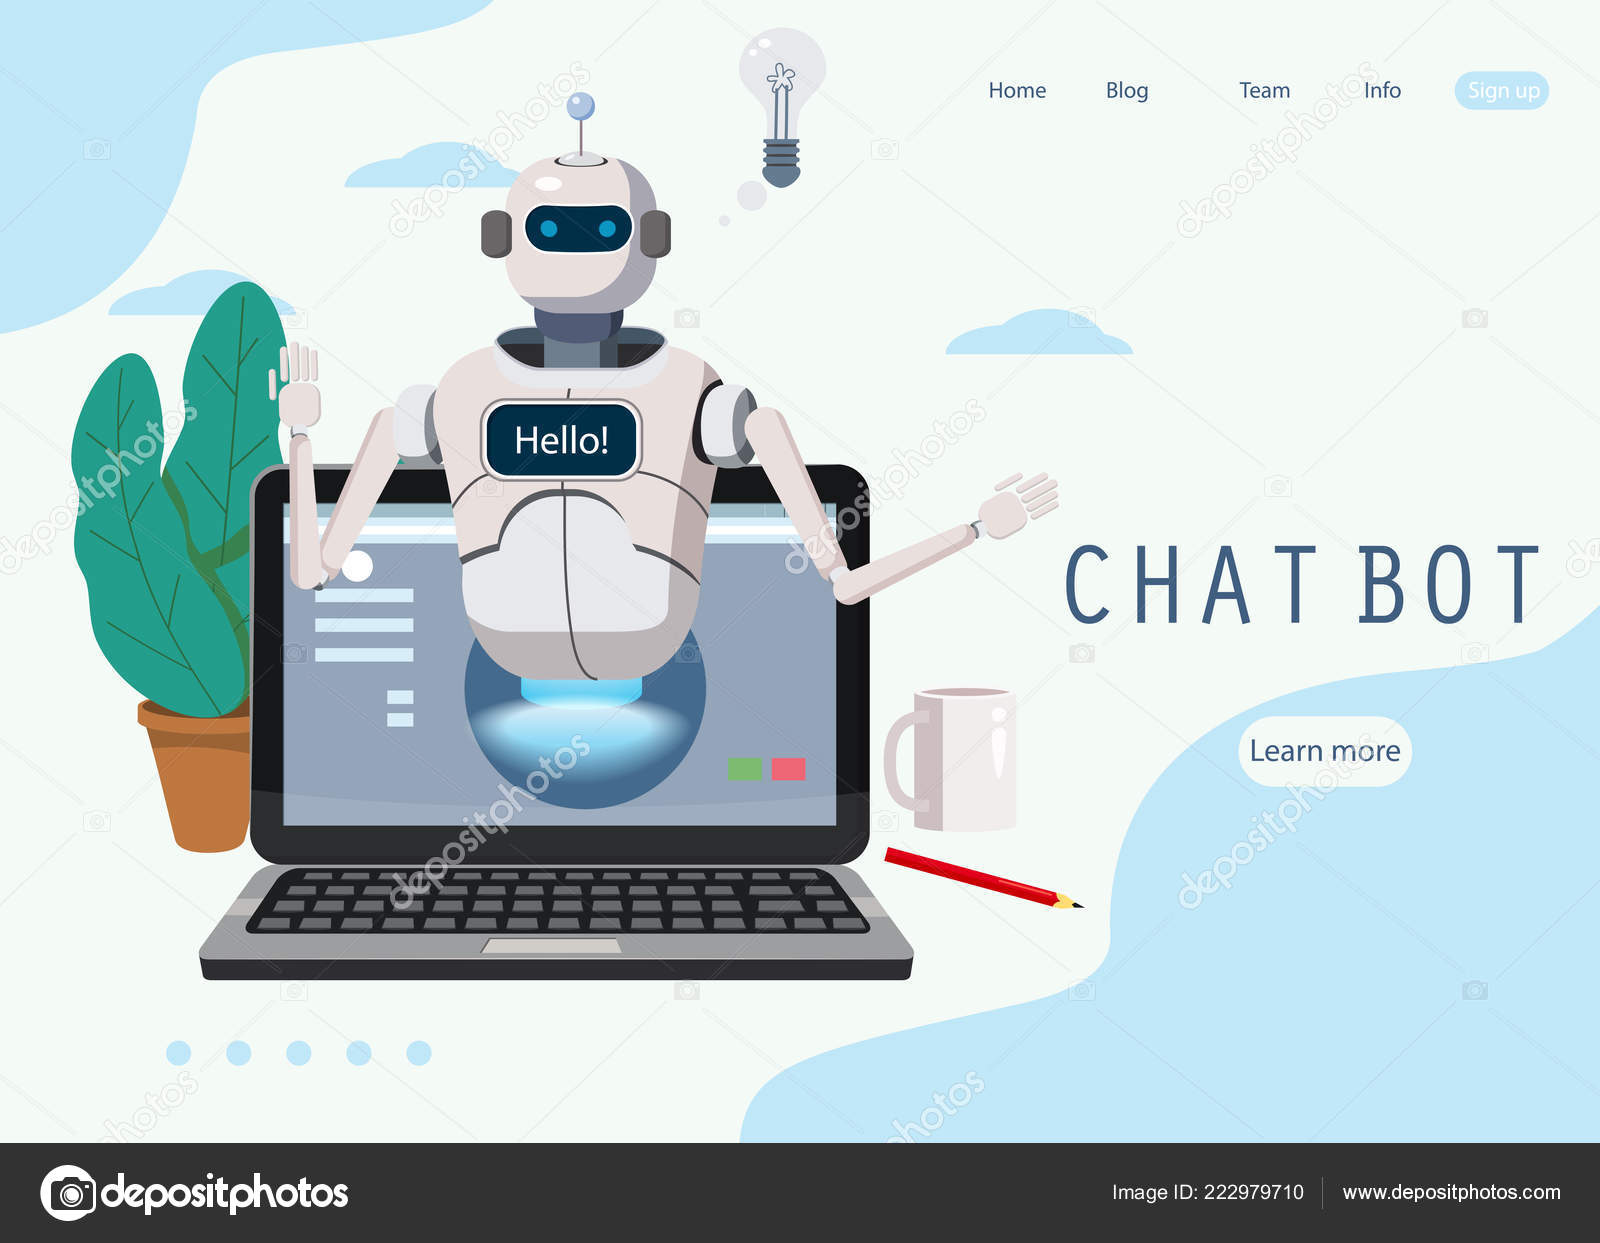 Pagina de chat gratis